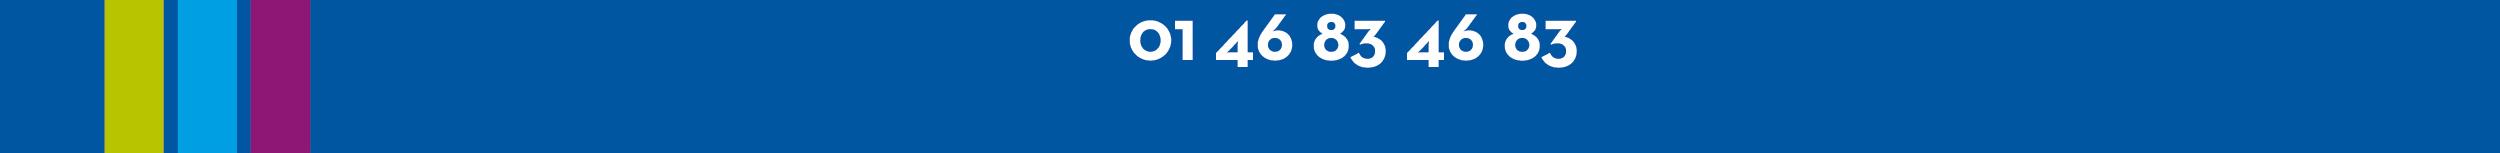 01 46 83 46 83